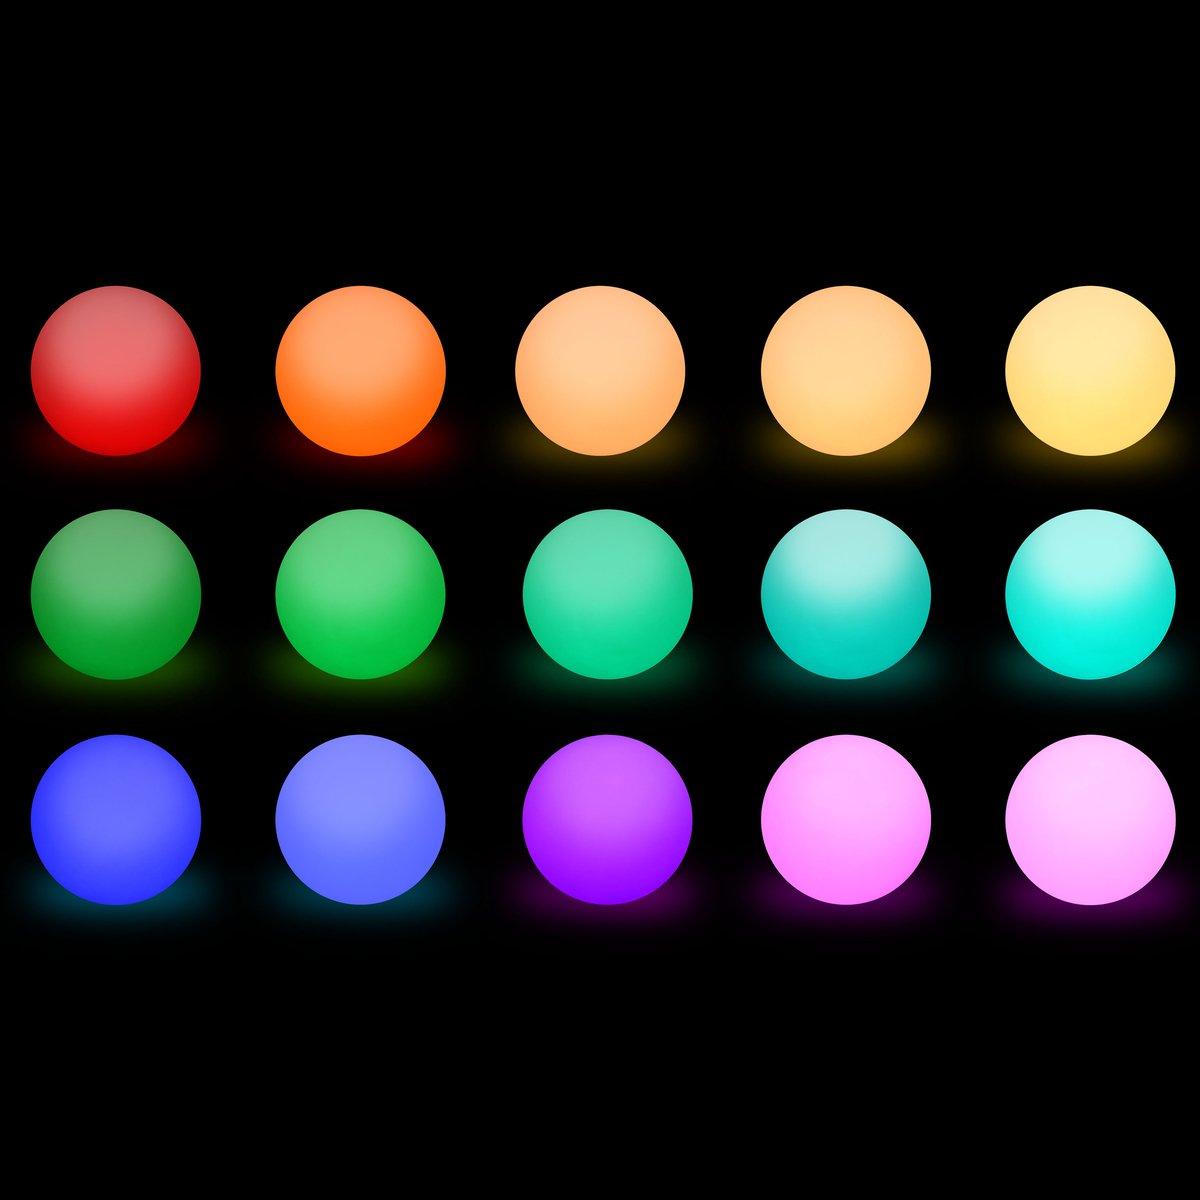 ESFERA LED /Ø30CM Alices Garden Iluminacion exterior 16 colores LED para jardin 50cm Bola luminosa multicolor recargable sin cables